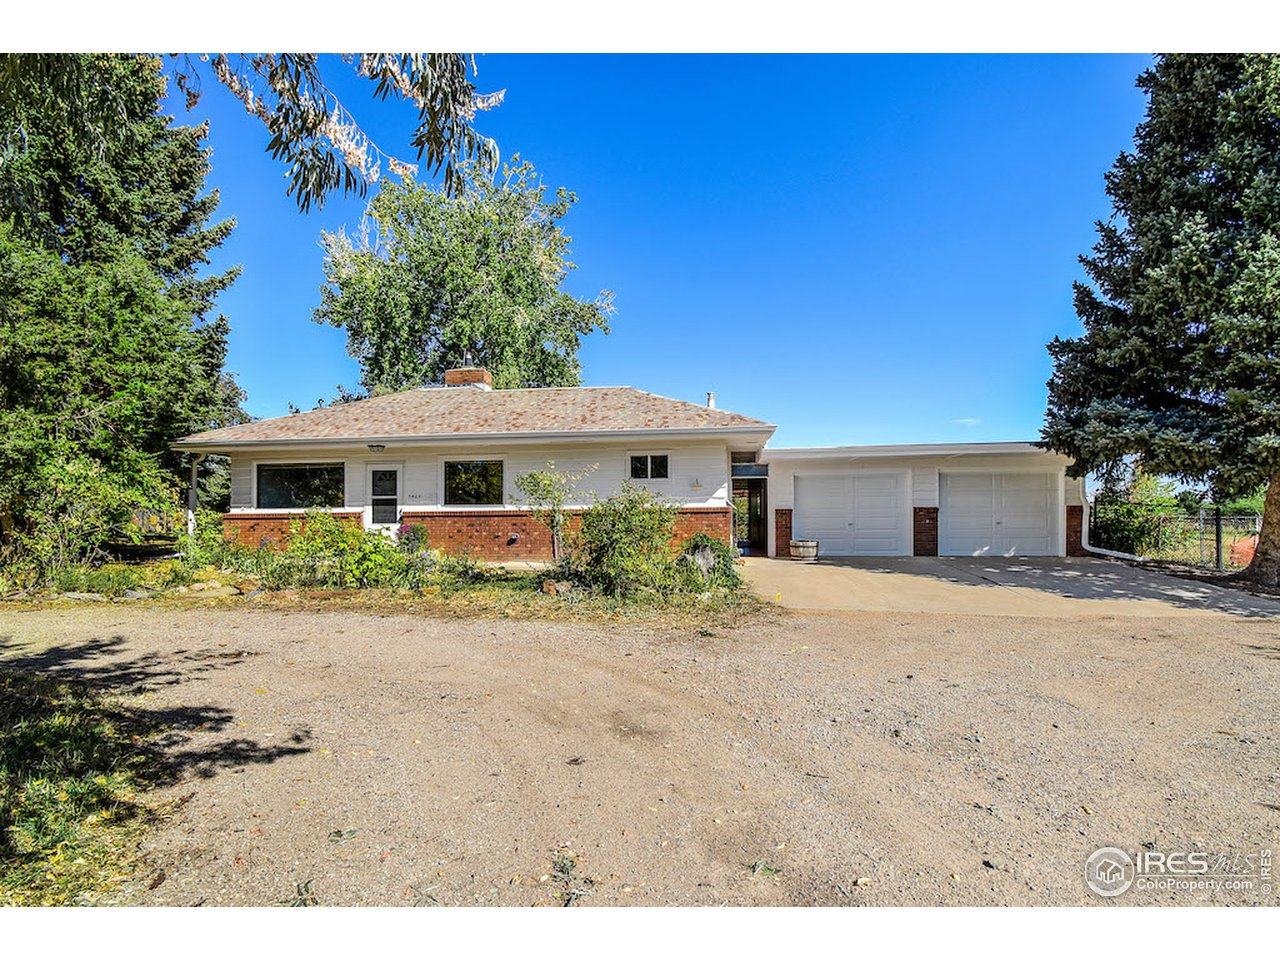 3465 Nebo Rd, Boulder CO 80302